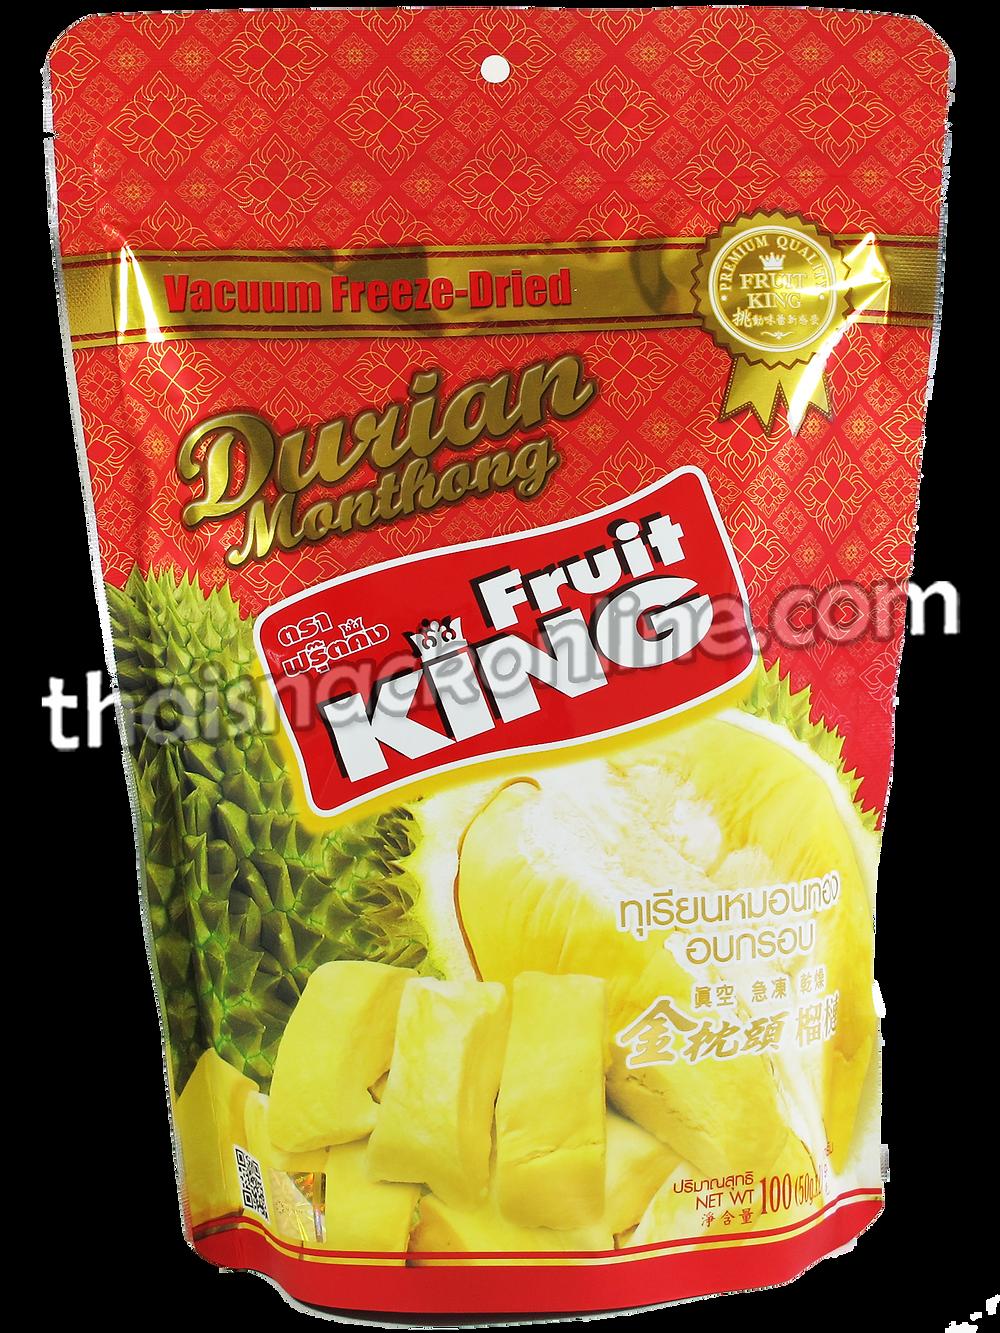 Fruit King - Dried Durian Monthong